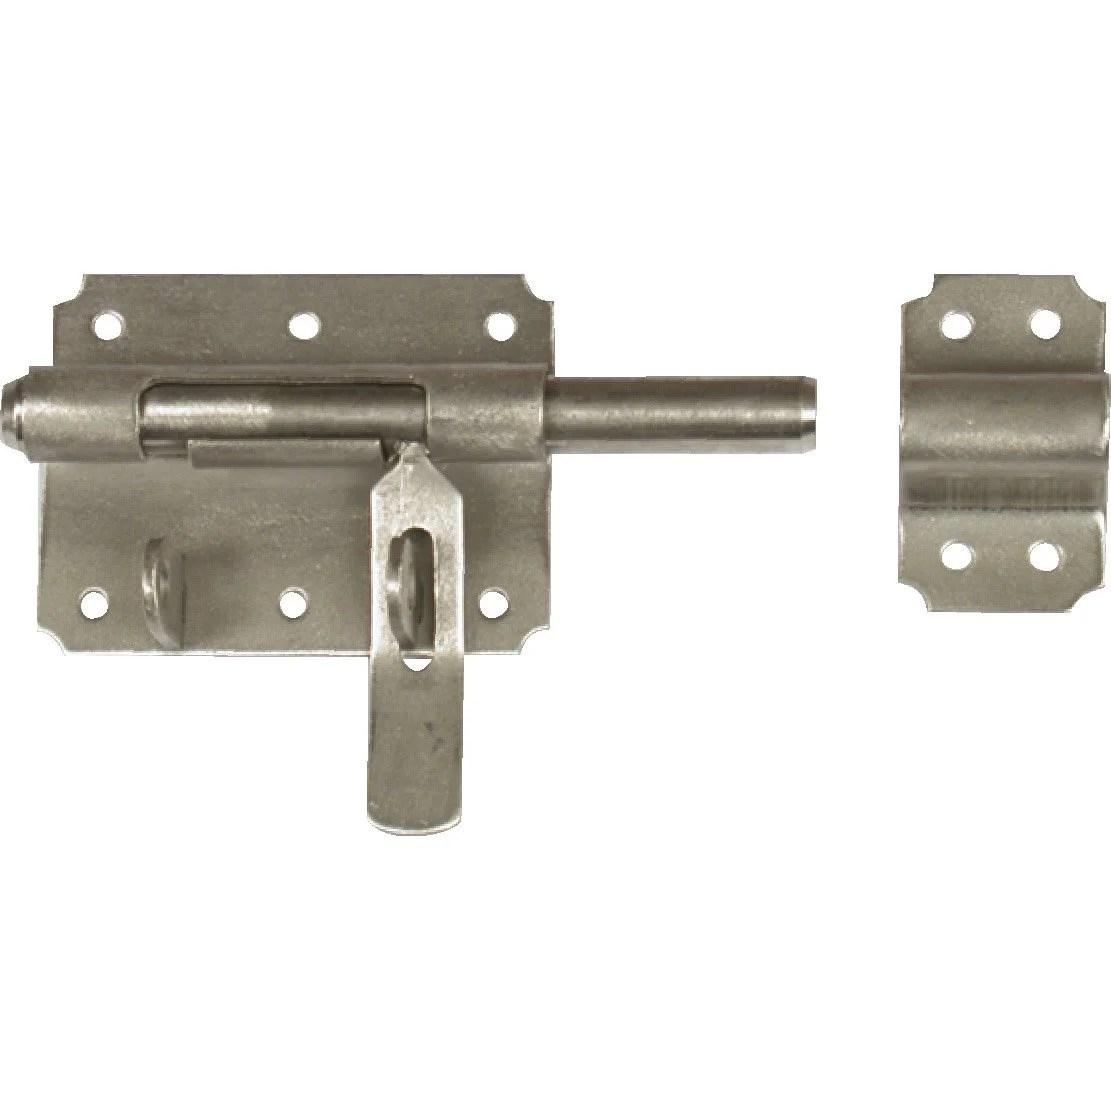 verrou de box porte cadenas inox brosse h 70 x l 140 x p 24 mm